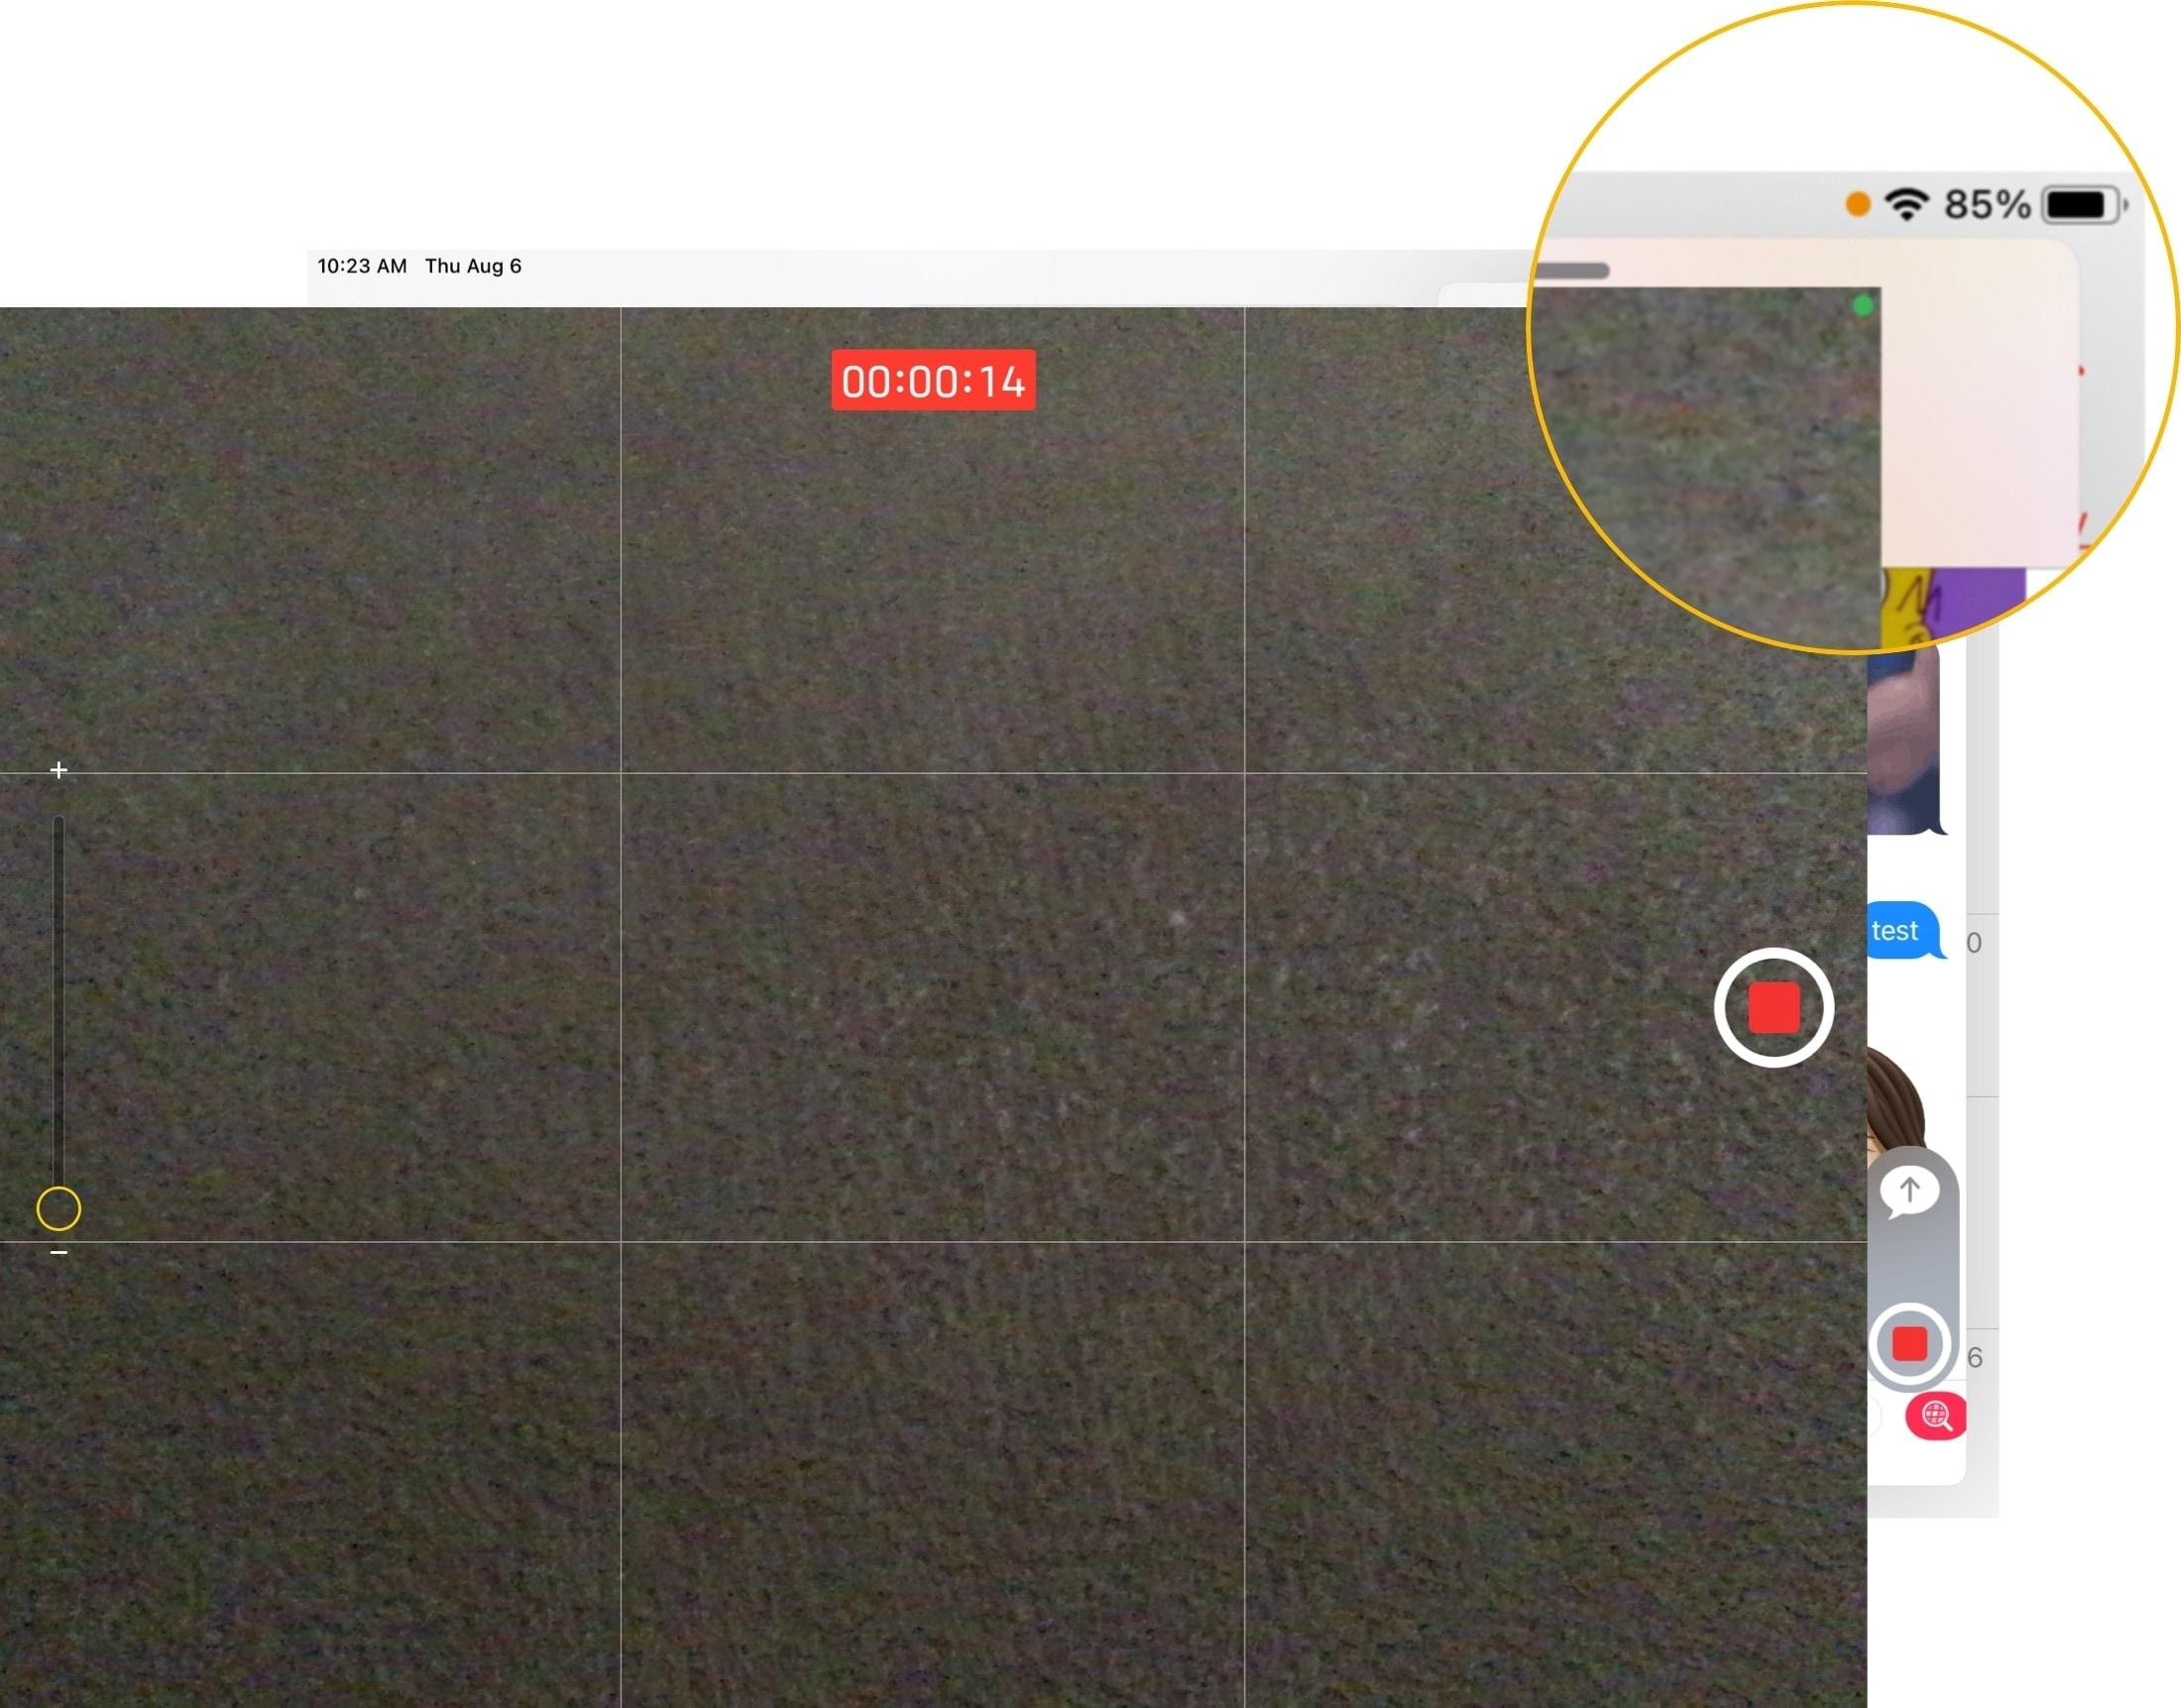 Camera Microphone Recording Indicators on iPad